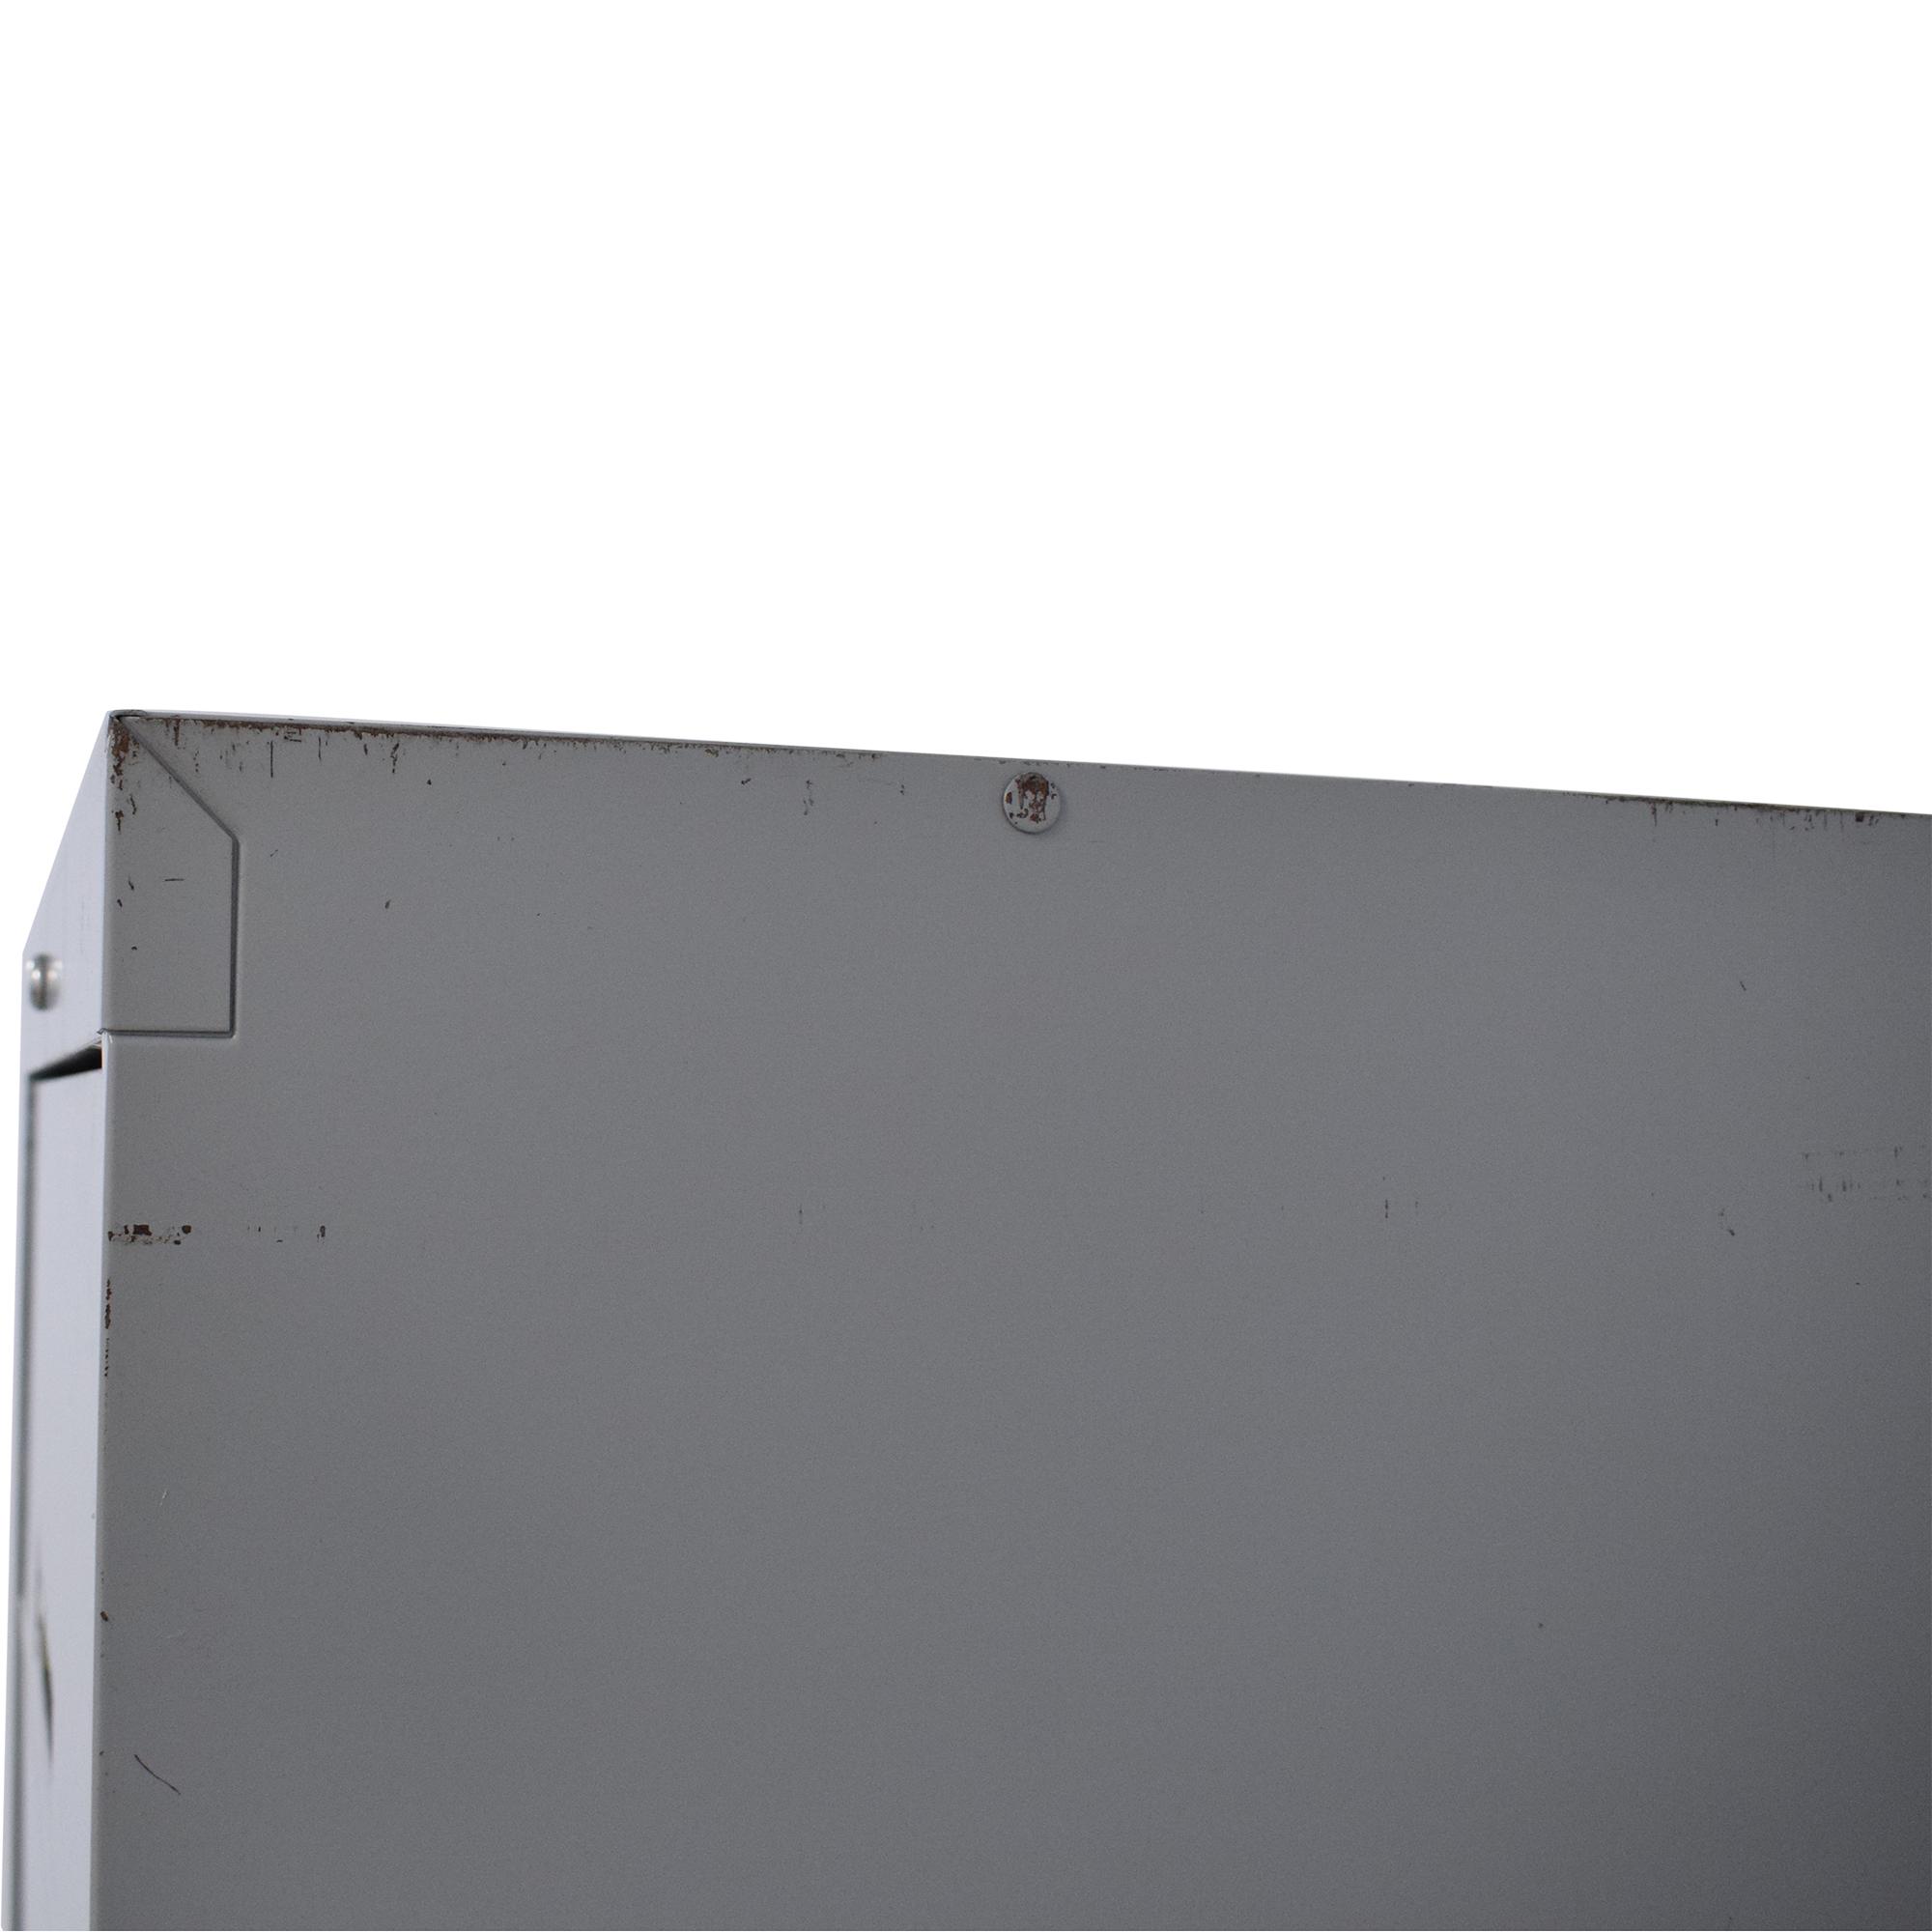 Hon Hon Lateral Filing Cabinet Storage